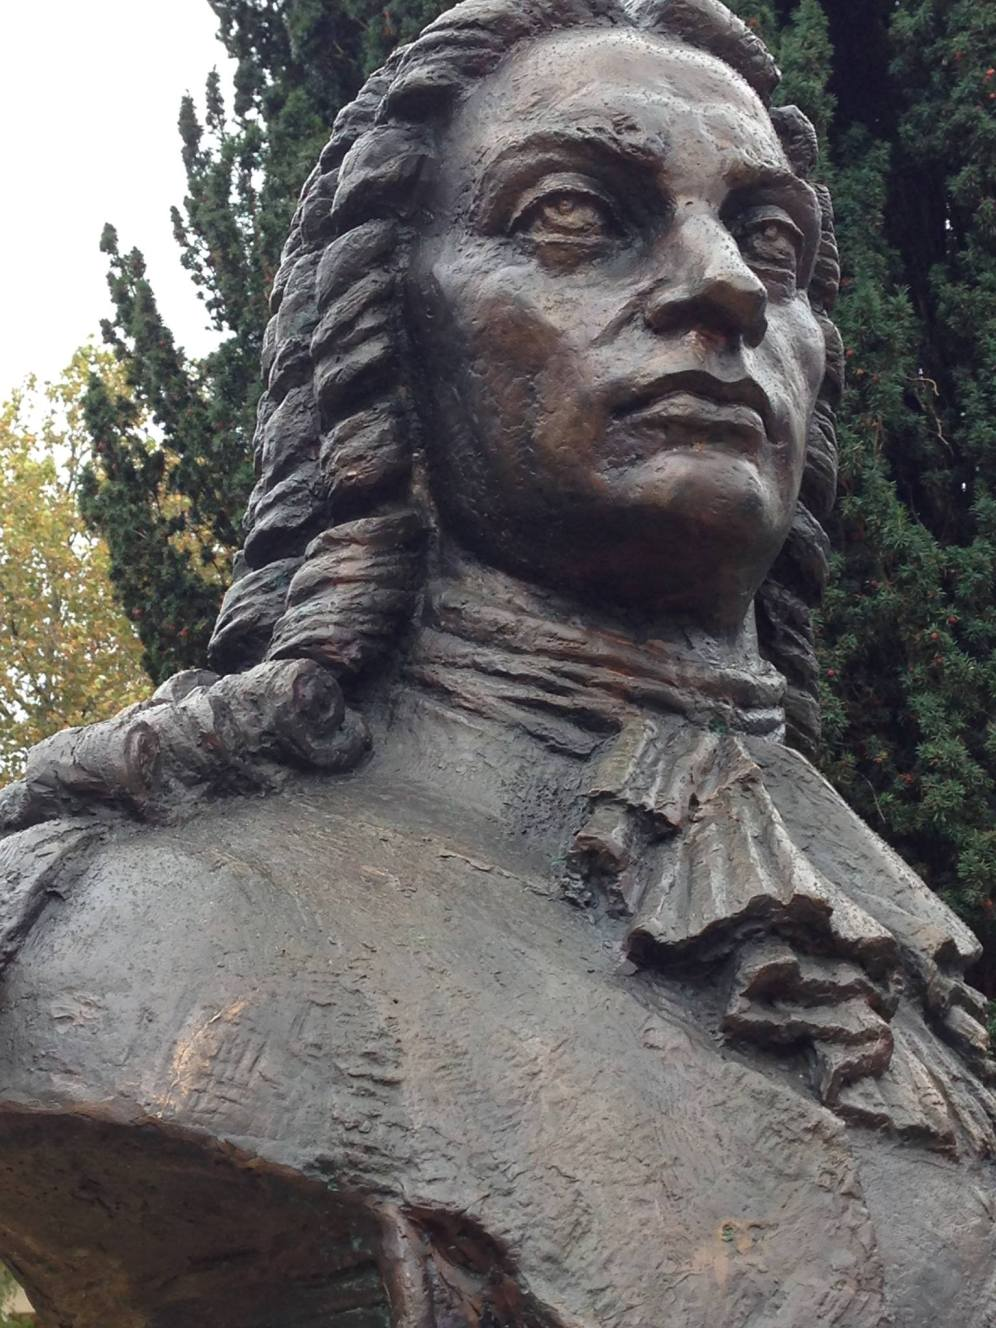 Bustul Dimitrie Cantemir dezvelit in Square Egide Rombaux, din Anderlecht, Bruxelles.